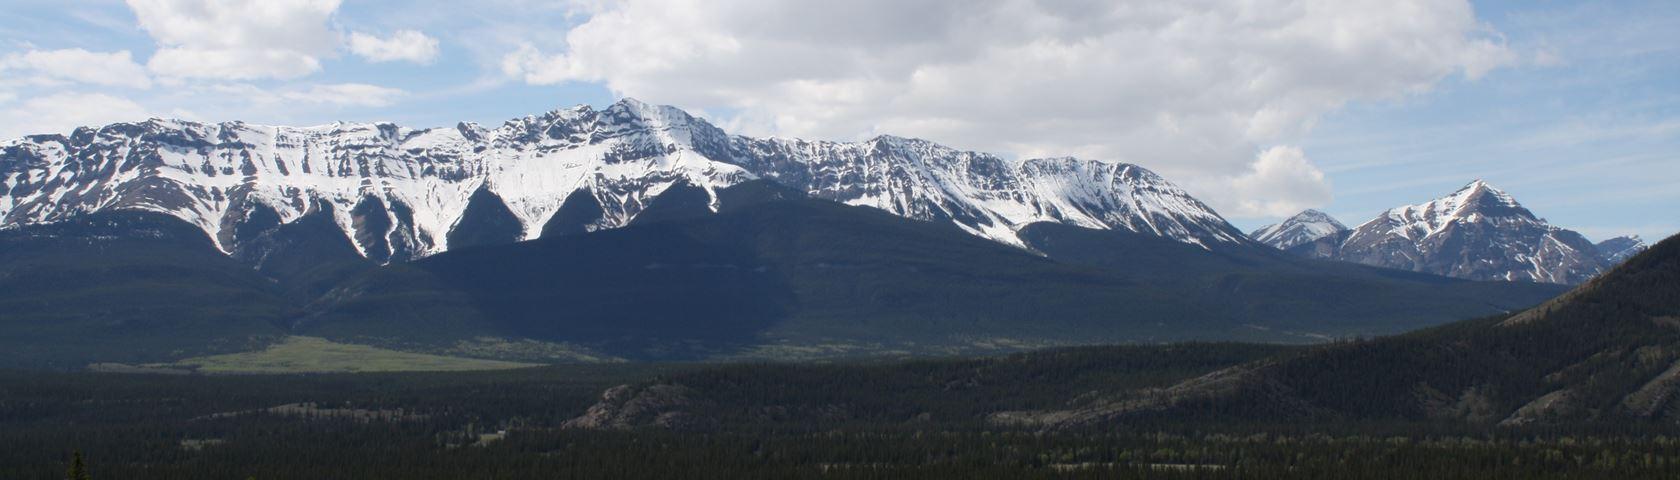 Jasper Mountain Range